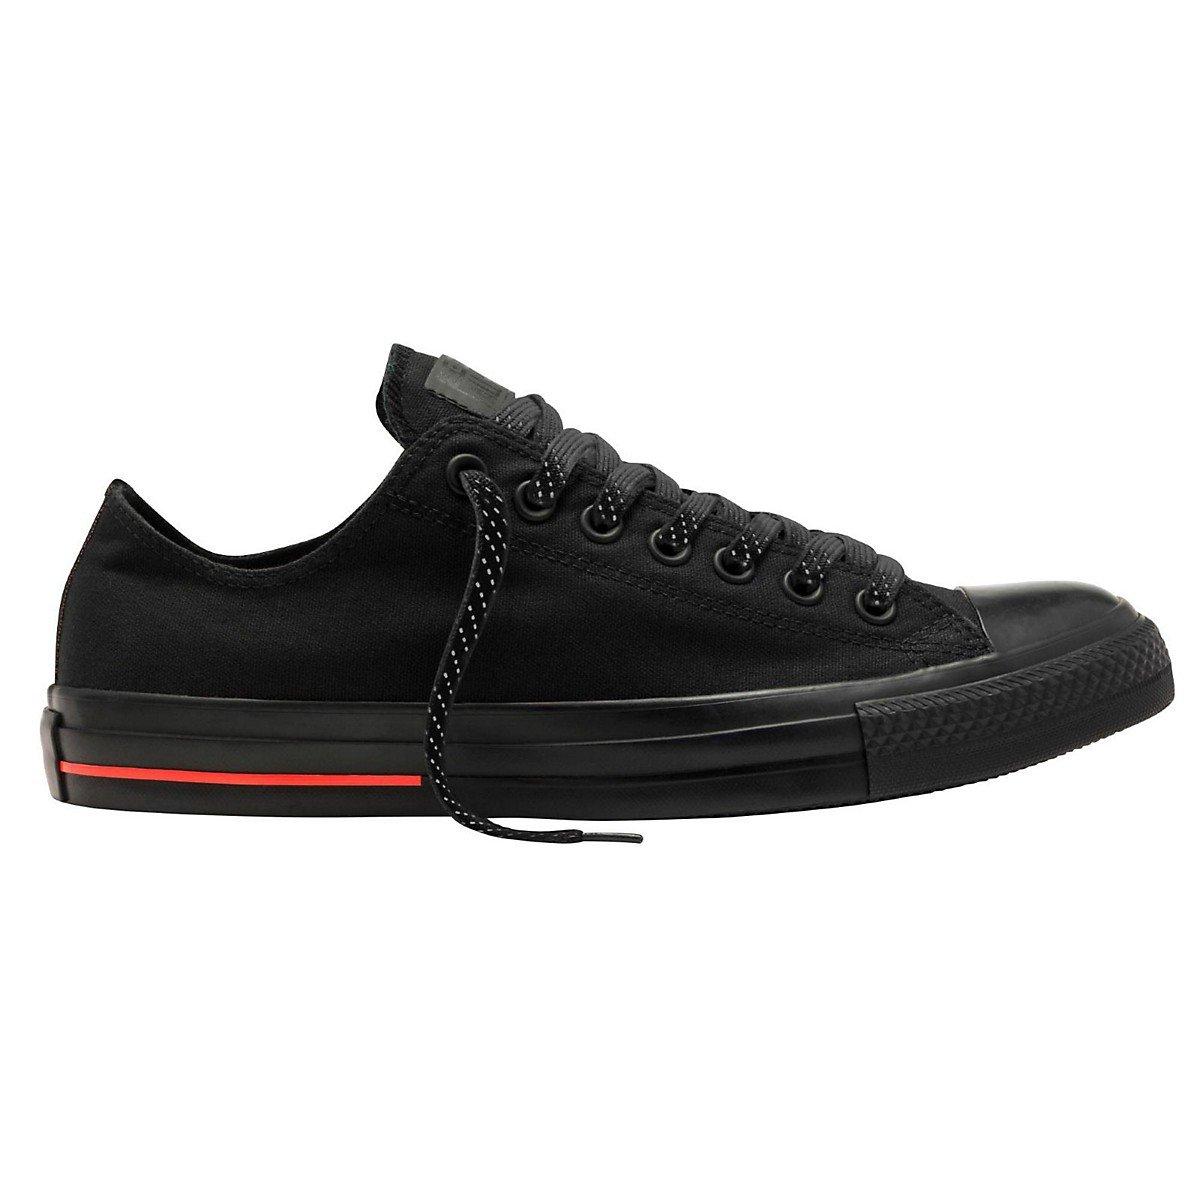 Converse Unisex Chuck Taylor All Star Low Top Black/Black/Lava Sneakers - 8 D(M)